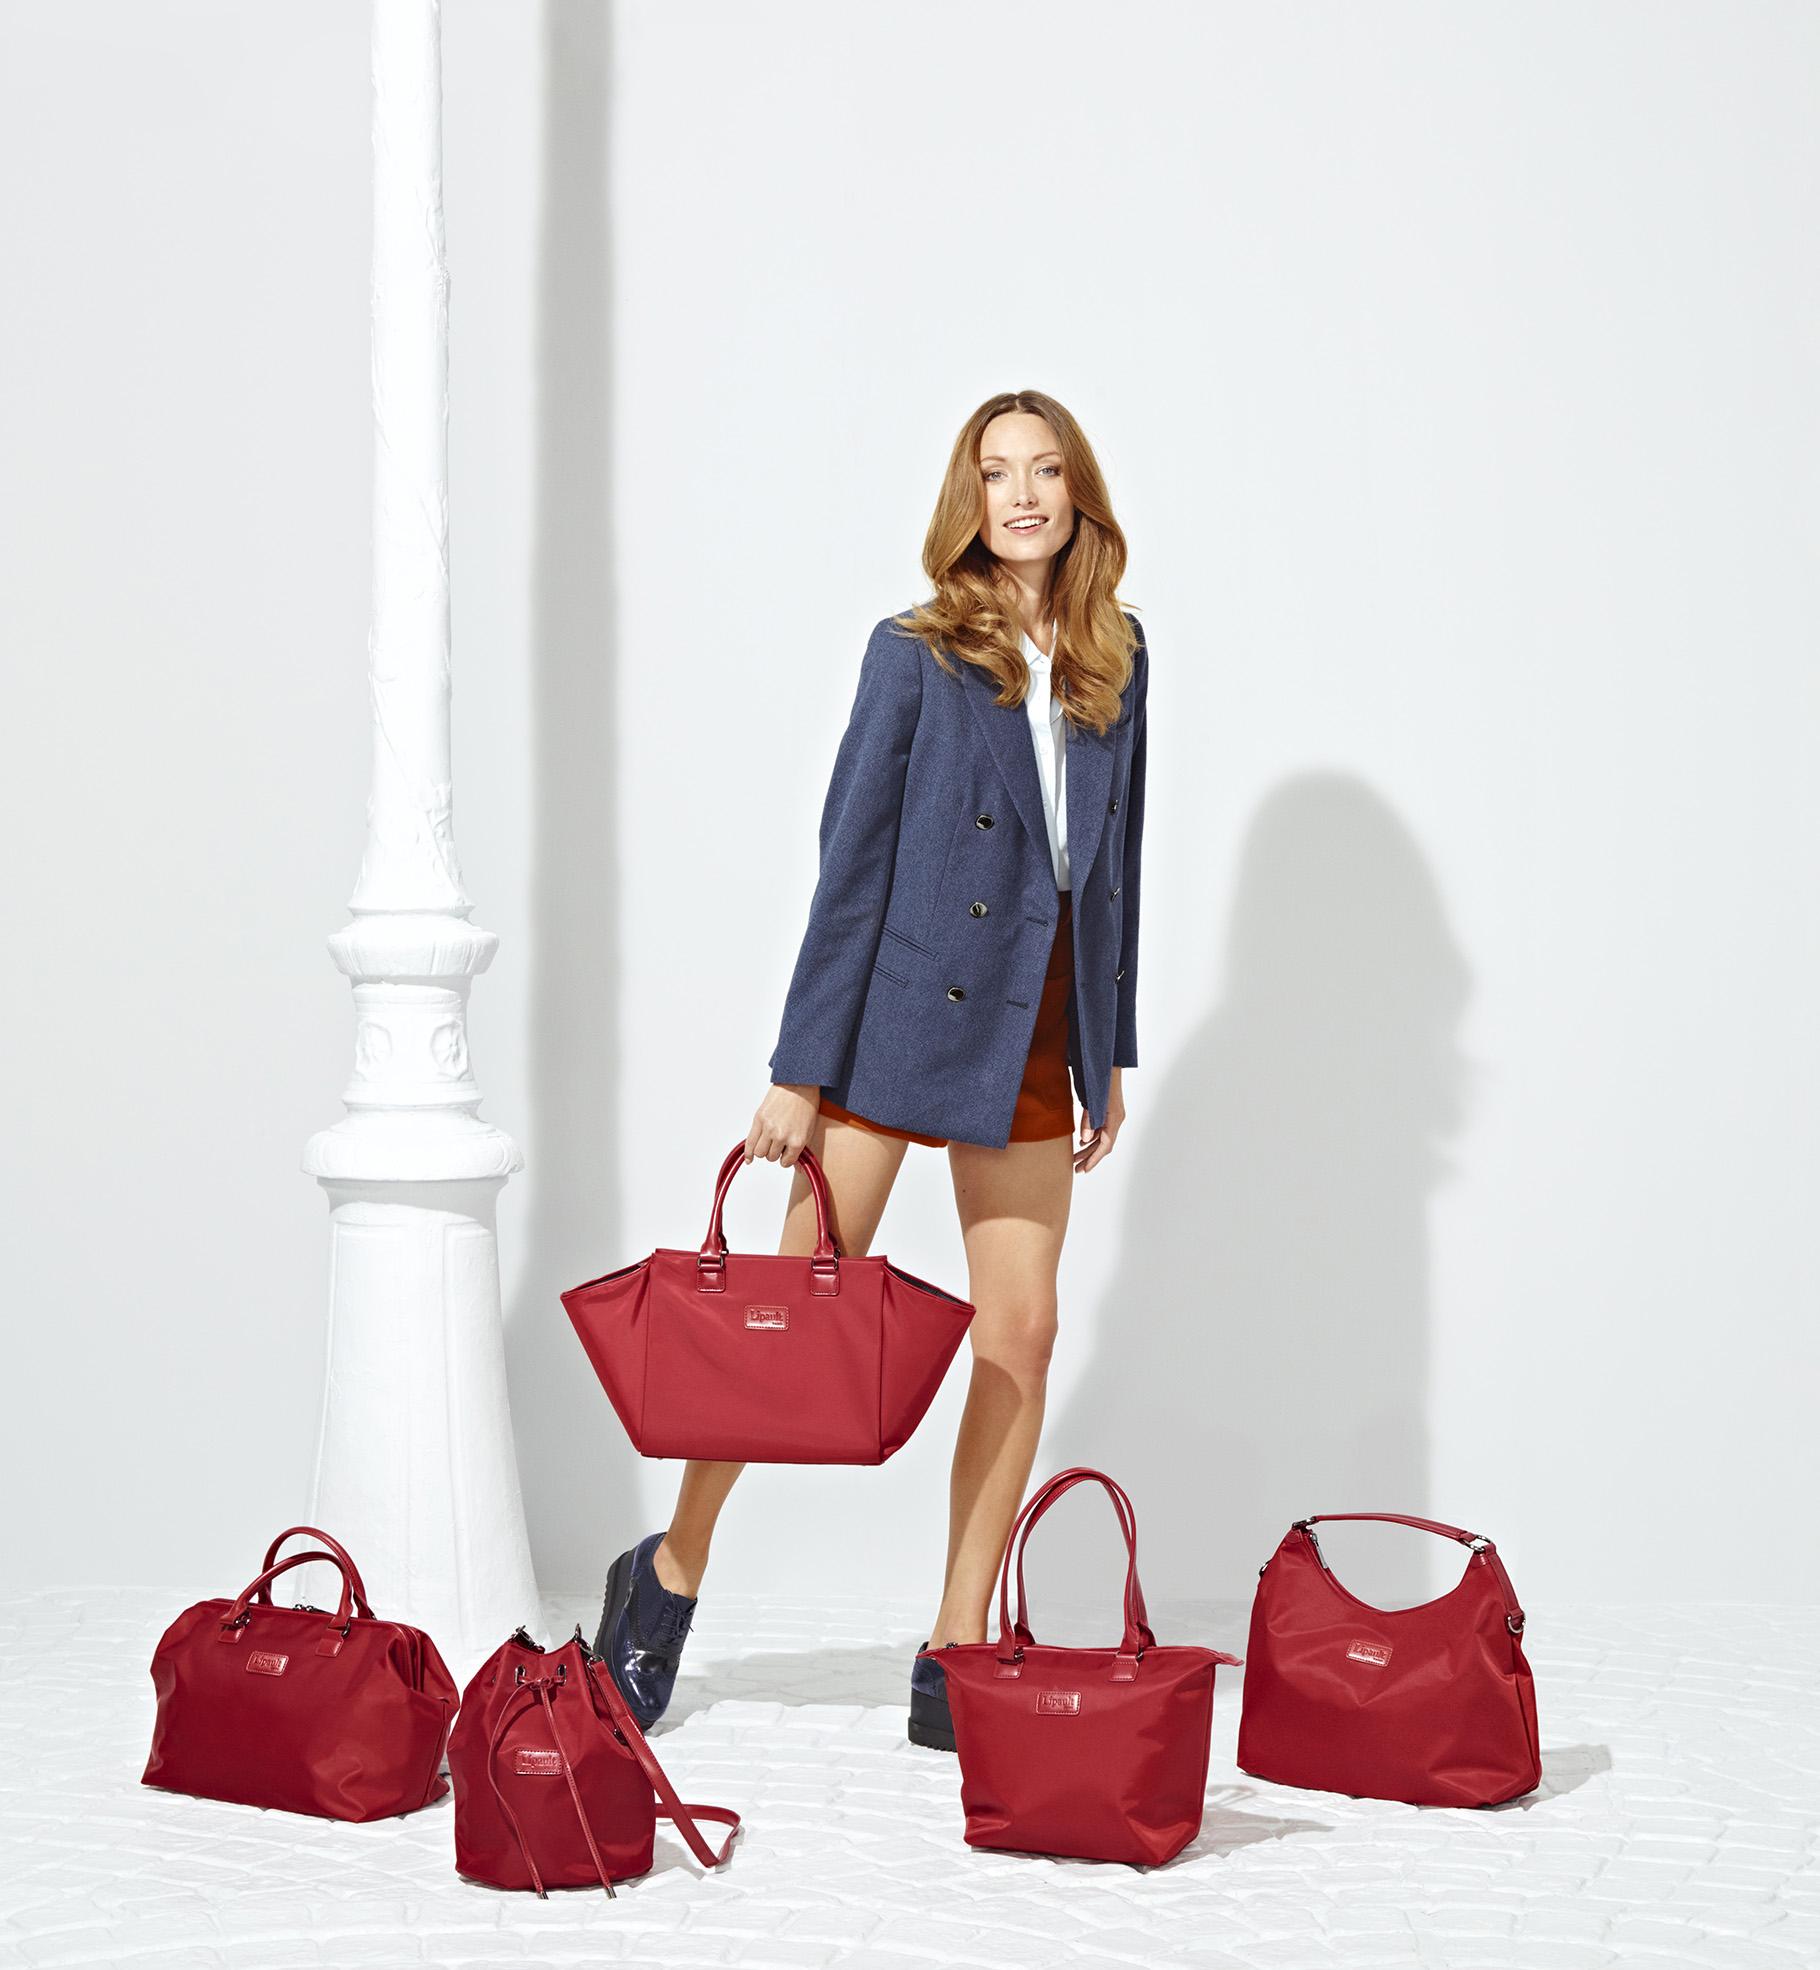 Lipault Lady Plume Satchel Bag M, Bowling Bag M, Bucket Bag S, Tote Bag S, Hobo Bag M all in Ruby 00100_1556